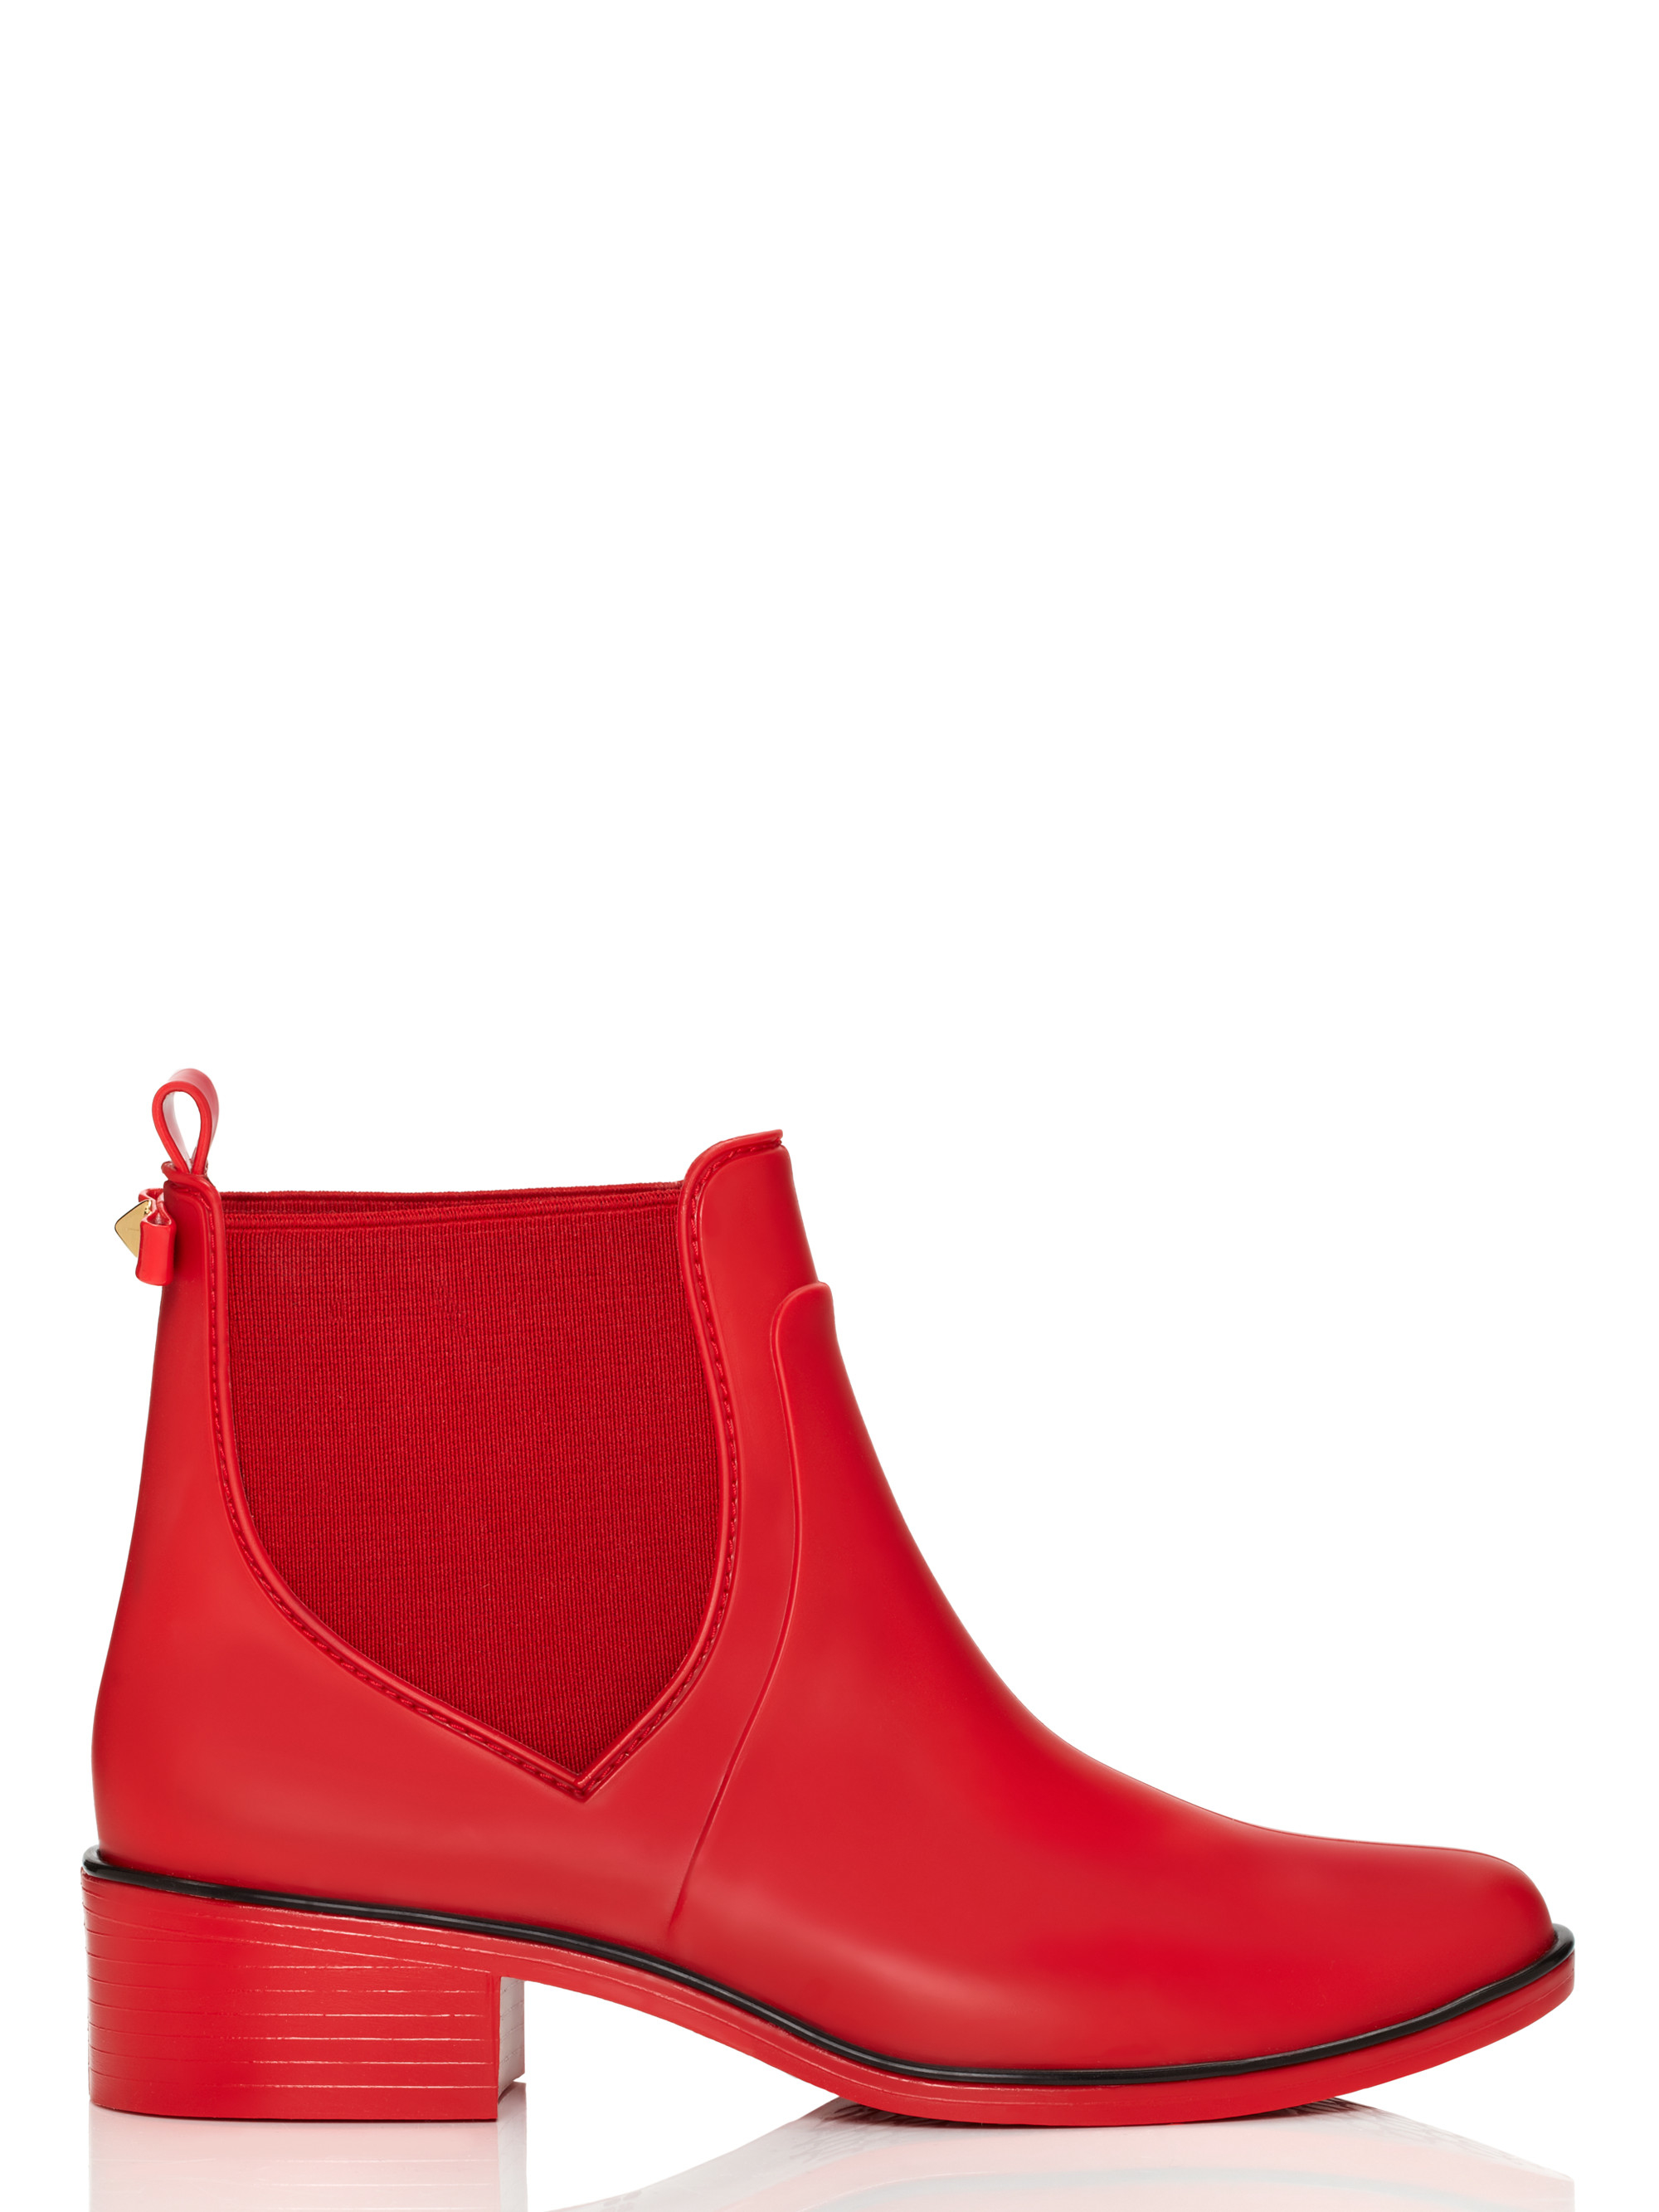 Lyst - Kate Spade Sedgewick Rain Boots In Red-3571